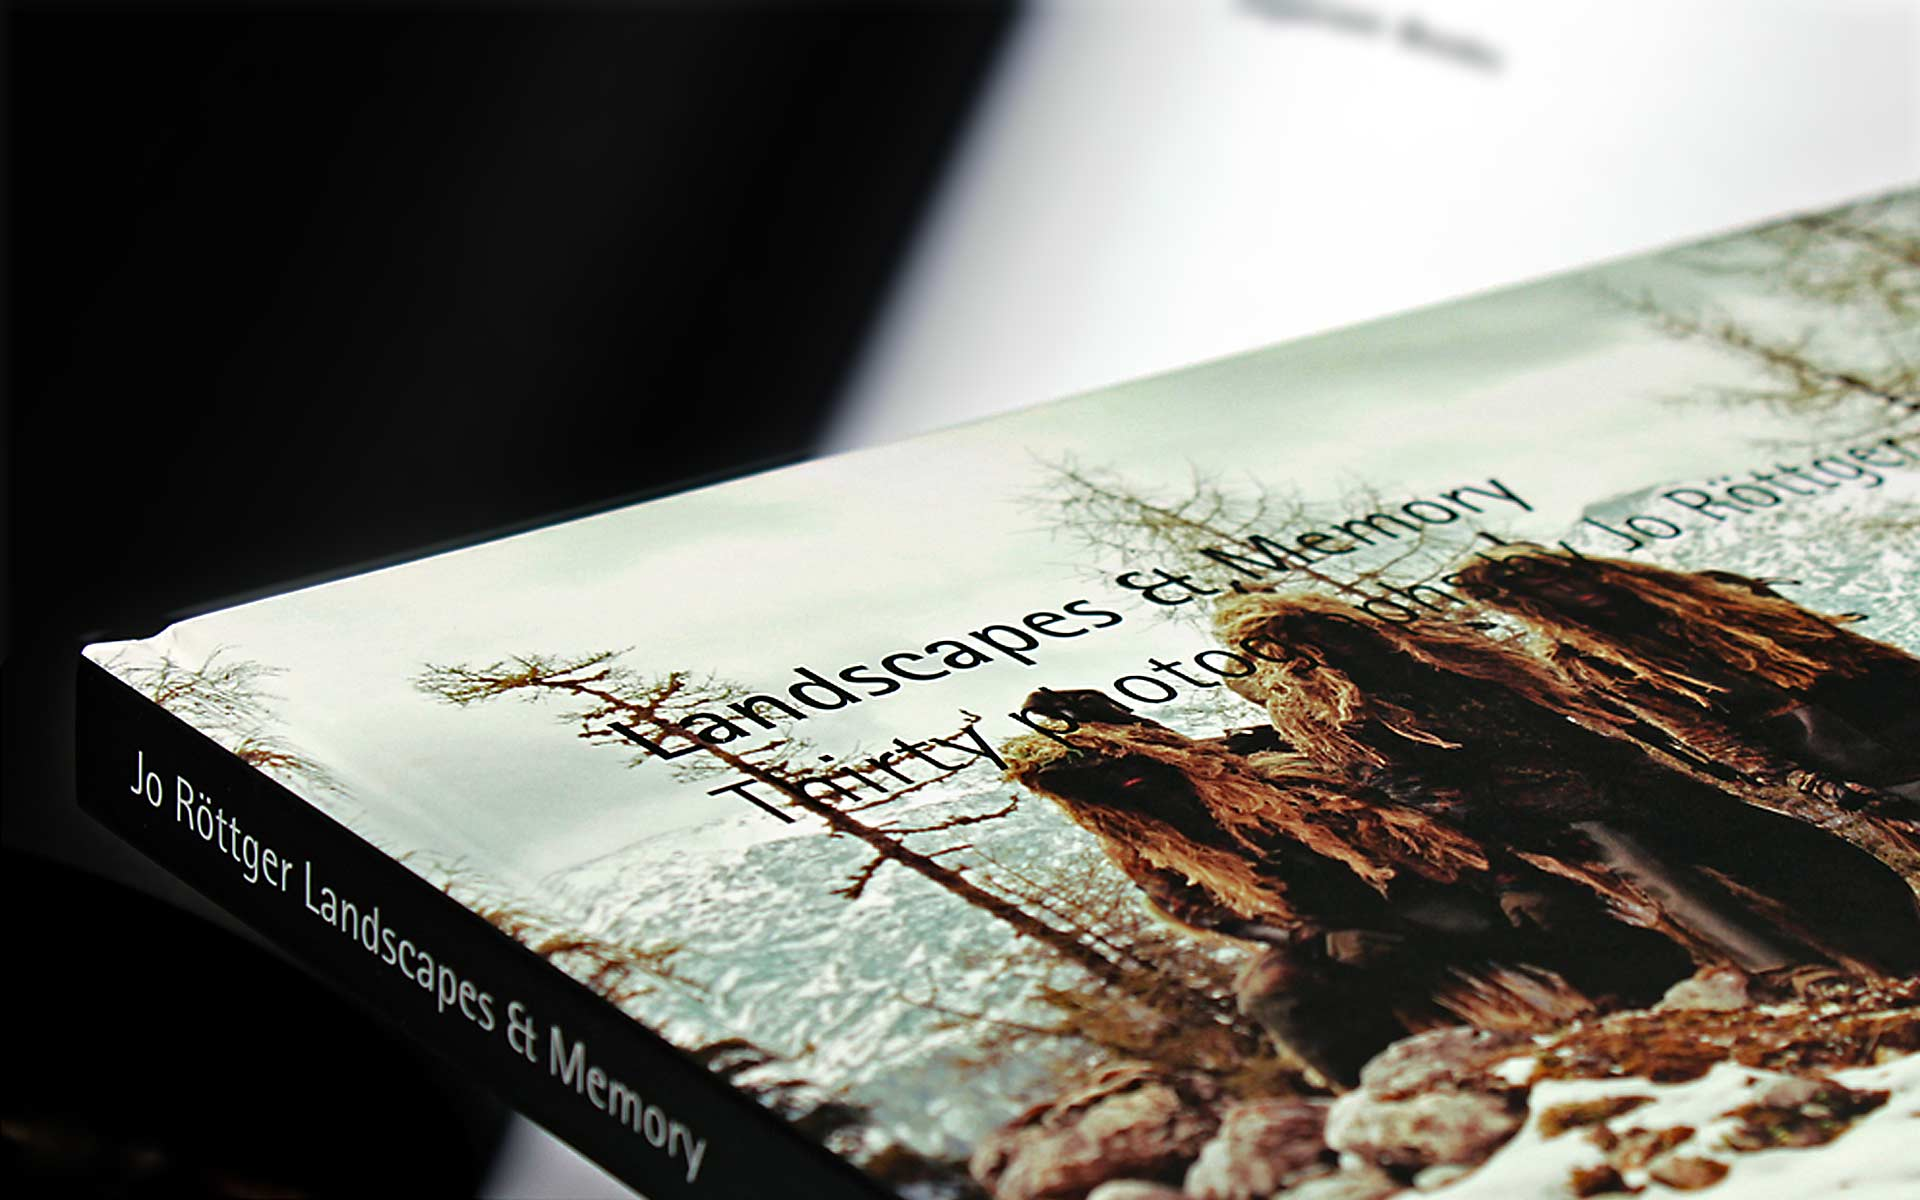 peperoni books, Titel des Fotobuchs »Landscapes & Memory« von Jo Röttger.